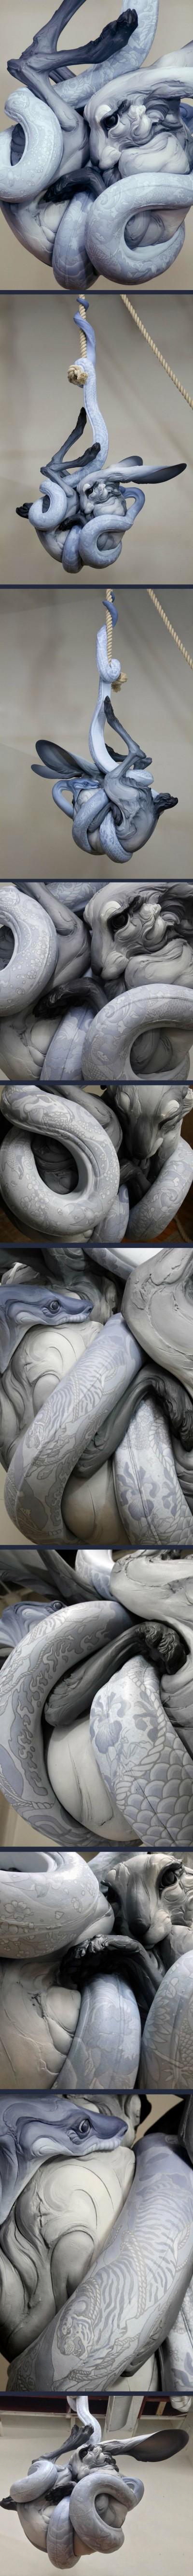 BETH CAVENER STICHTER and Alexandro Gallo – Sculpture